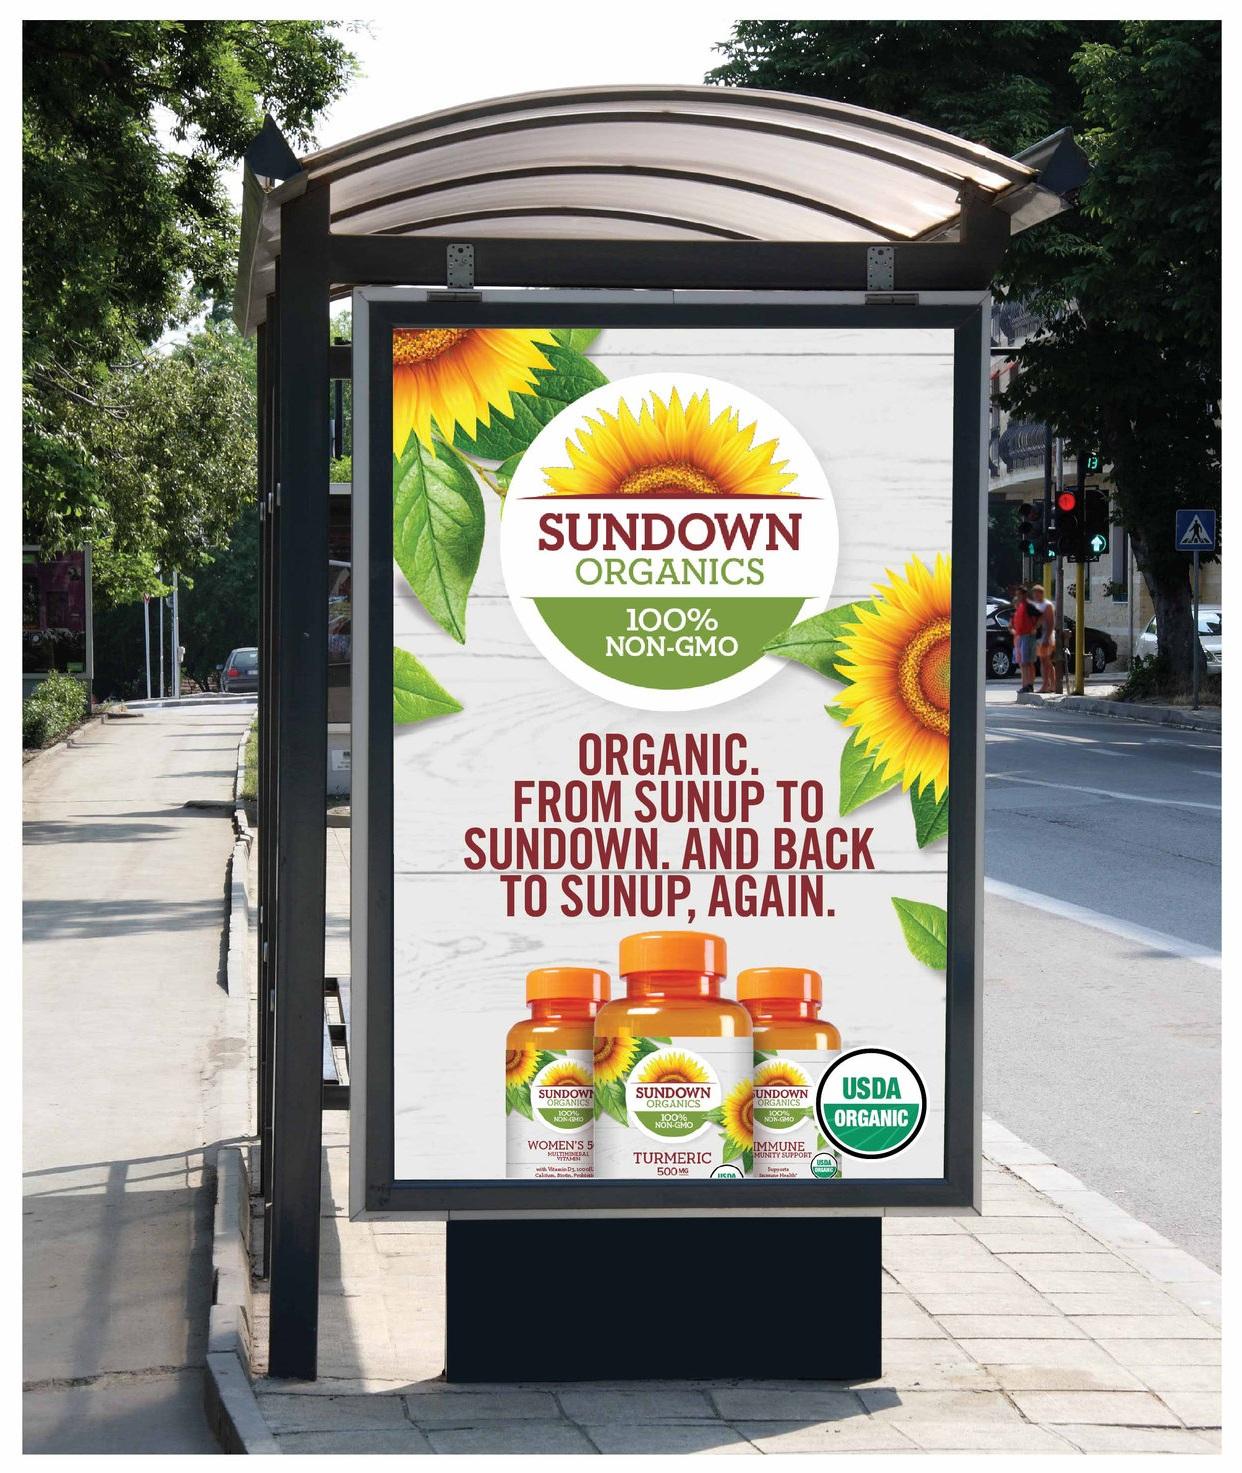 SundownClean-Organics__T5_APPS-03.jpg